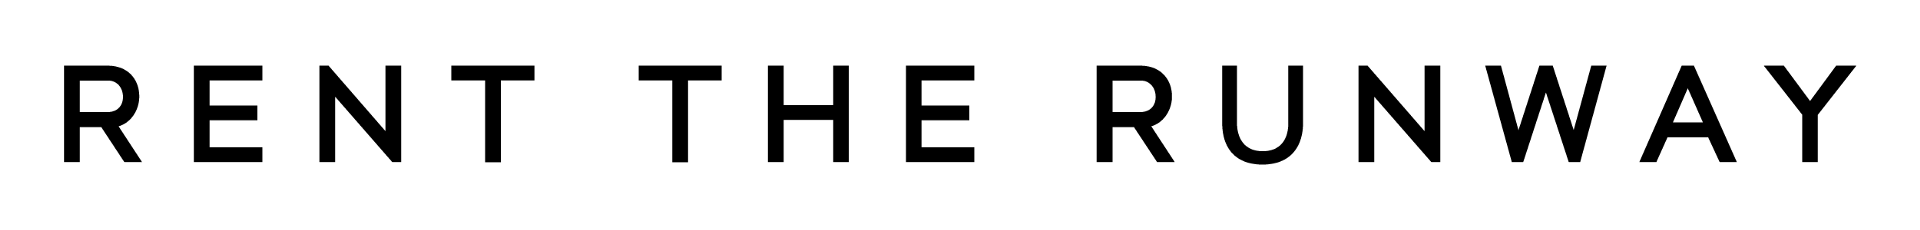 Logotipo de Rent the Runway